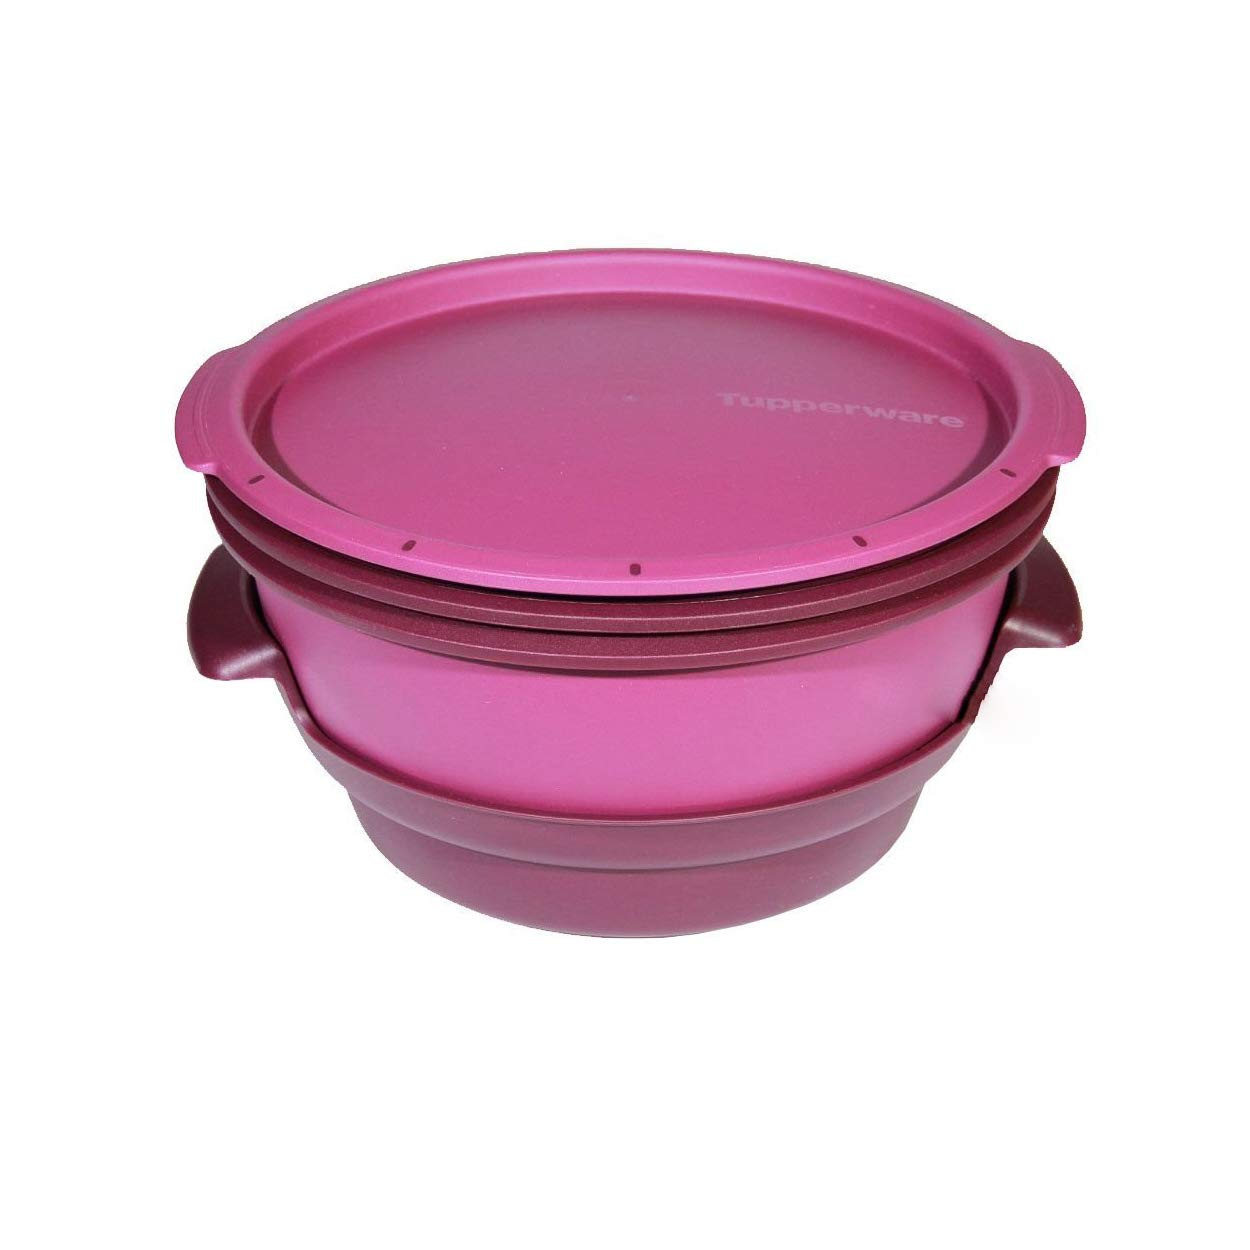 Tupperware Smart Steamer in new Purple Color